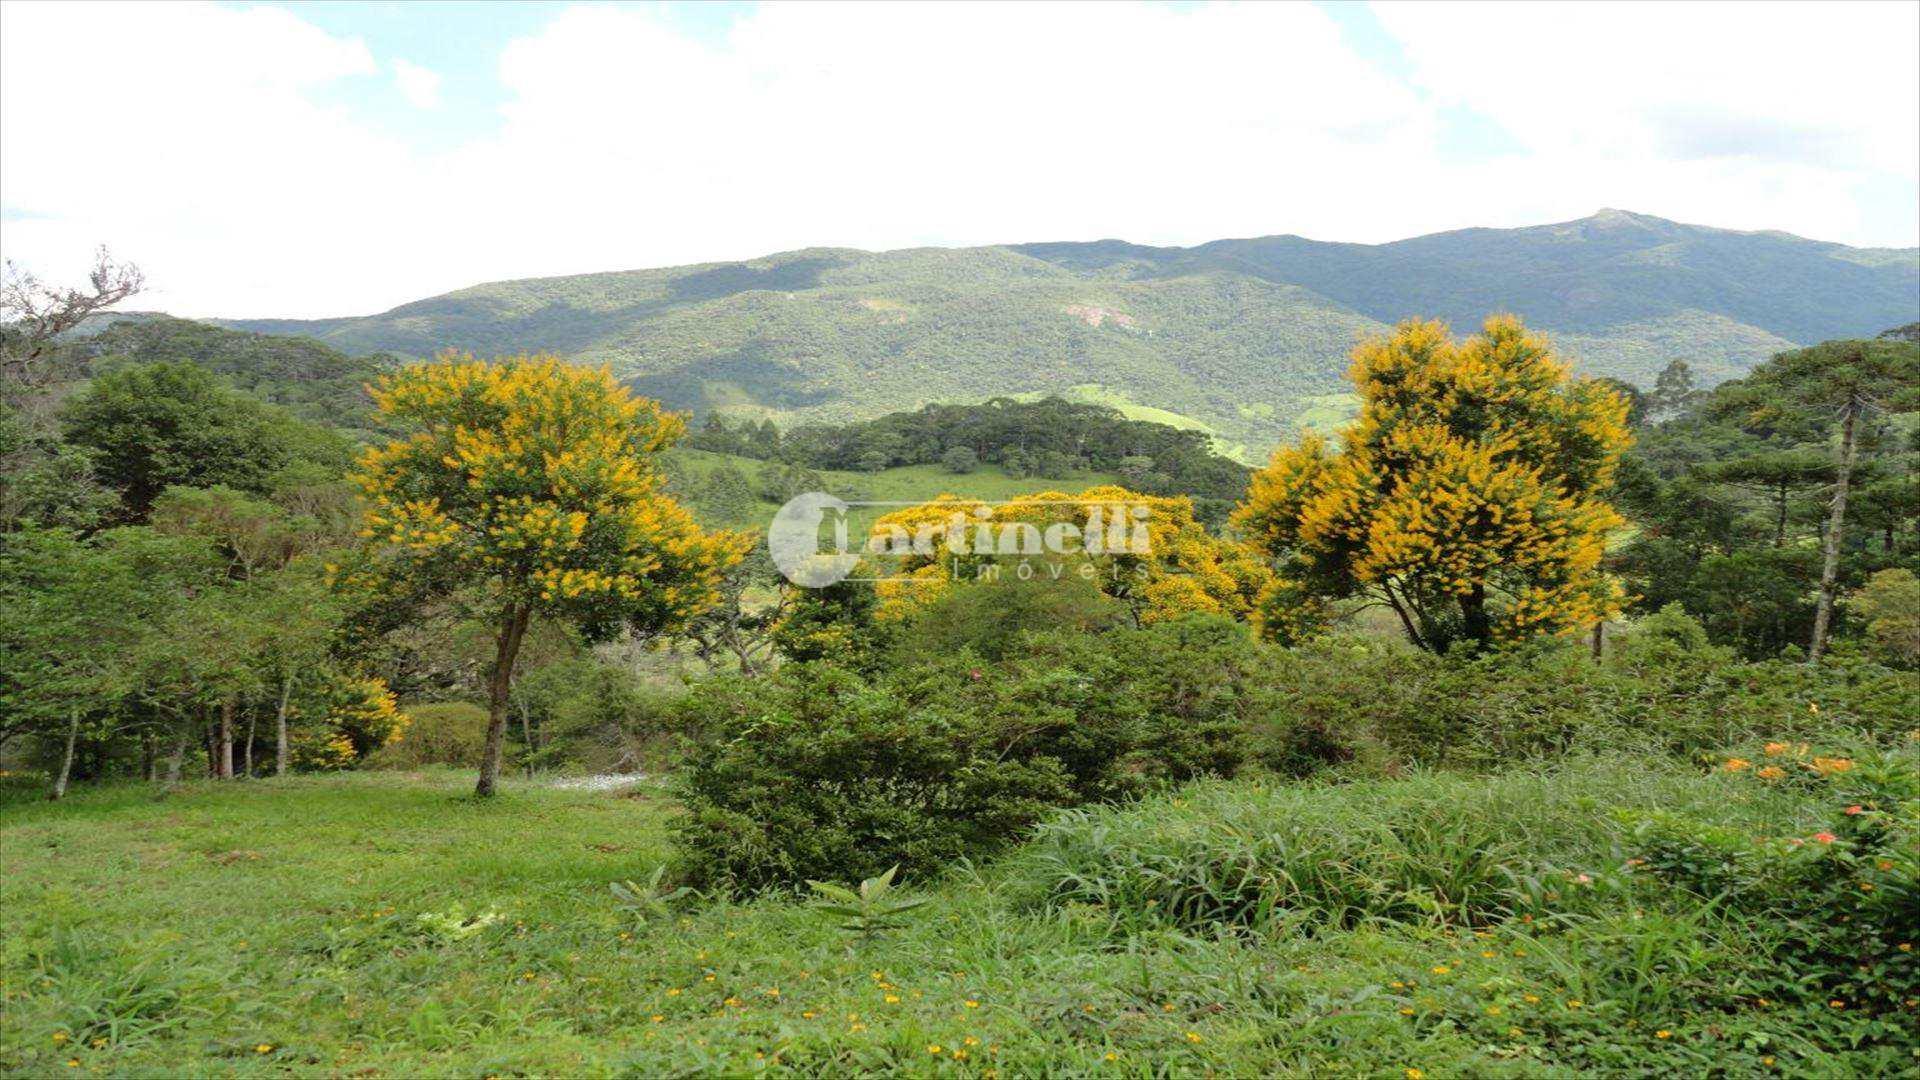 Sítio com 3 dorms, Zona Rural, Sapucaí-Mirim - R$ 600 mil, Cod: 589